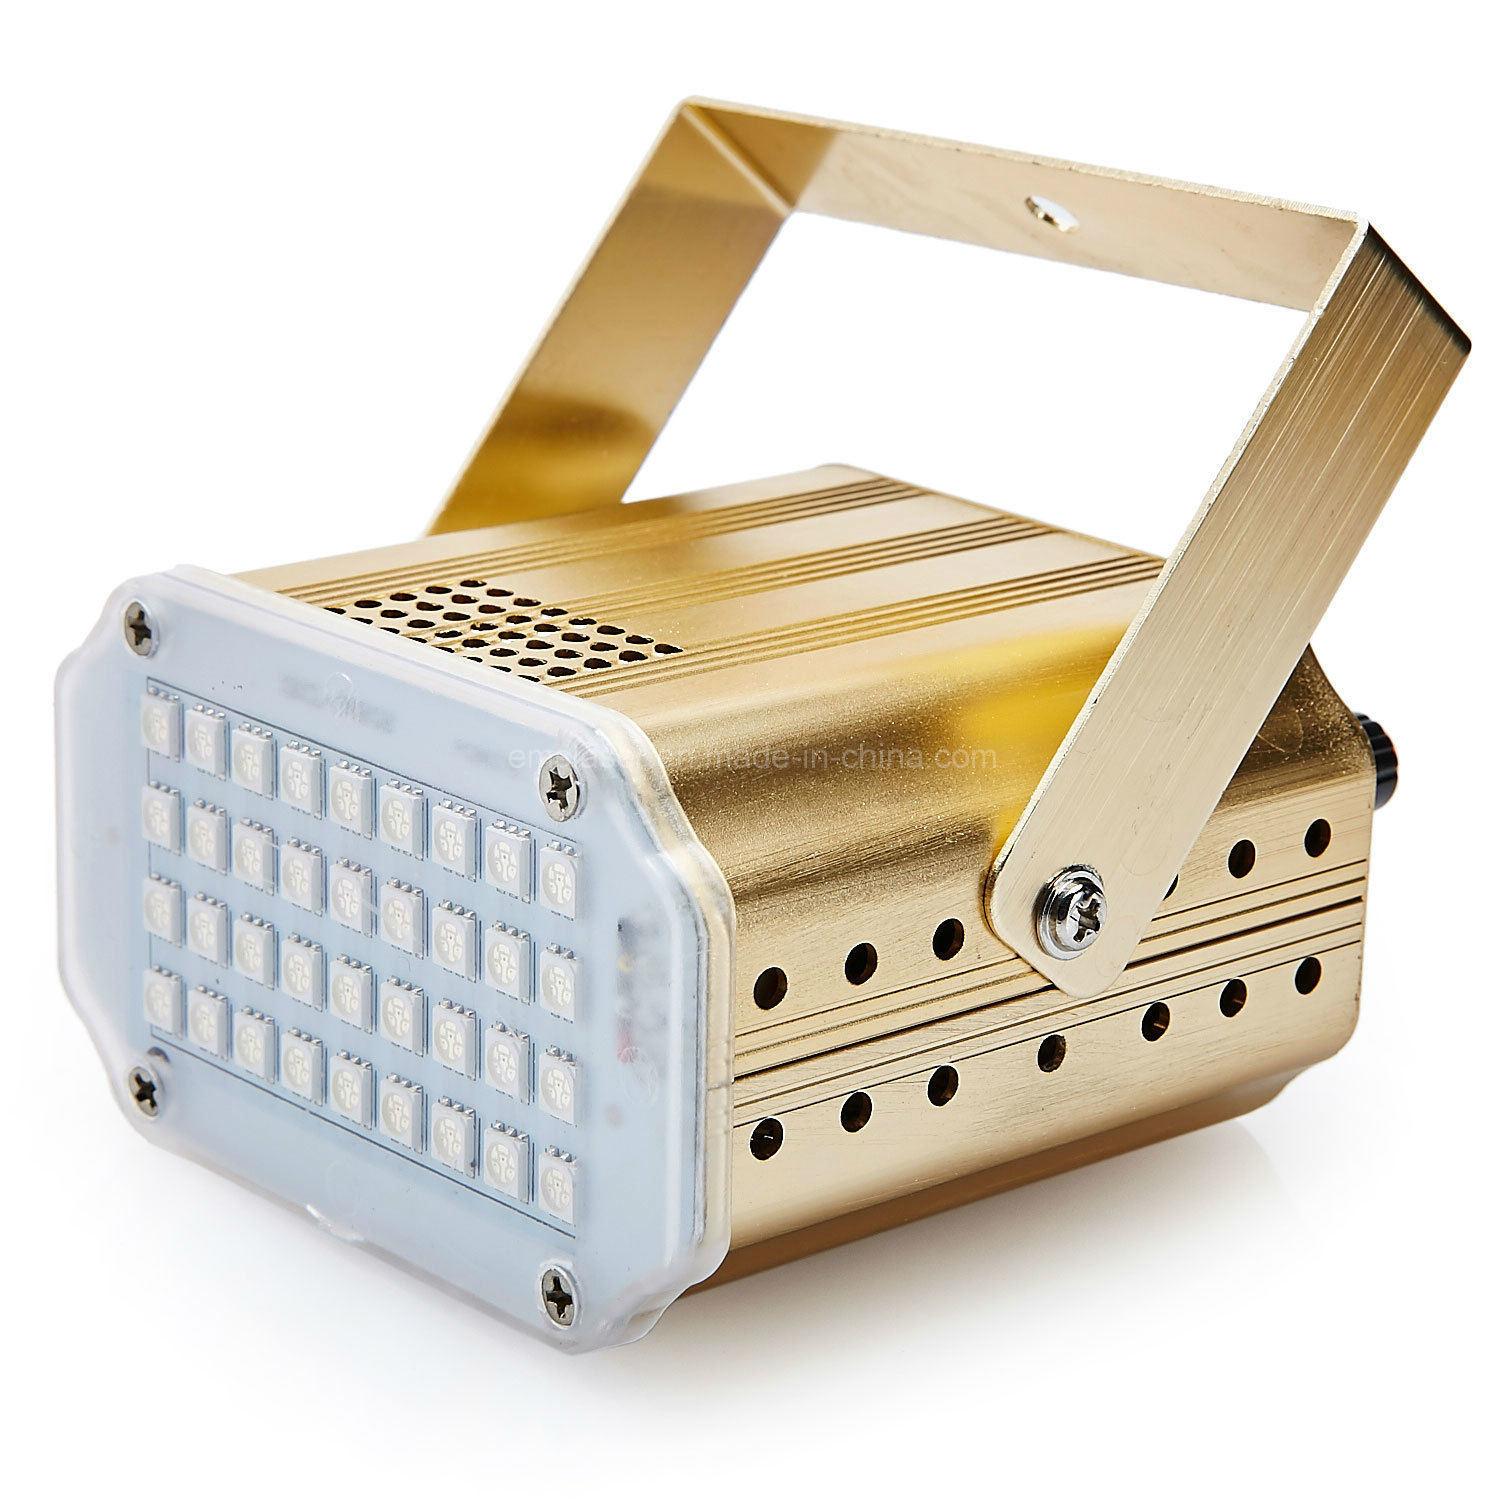 New LED Strobe Light for DJ 36 PCS LED SMD 5050 RGB Strobe Party Stage Light with Sound Auto Control Mode